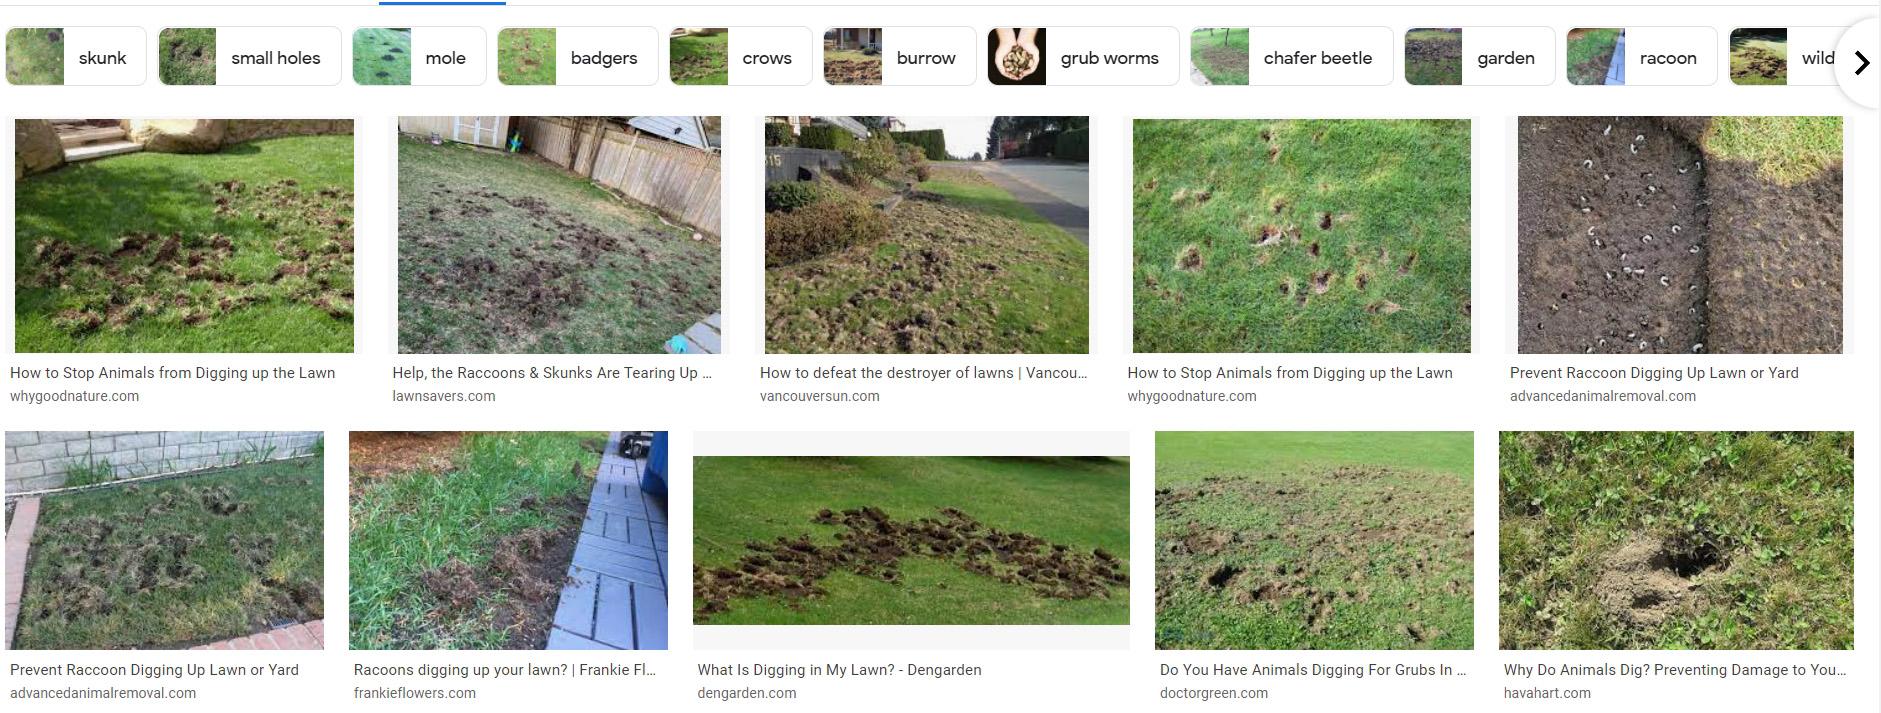 Кейс: как картинка на сайте повлияла на ранжирование в Google 5